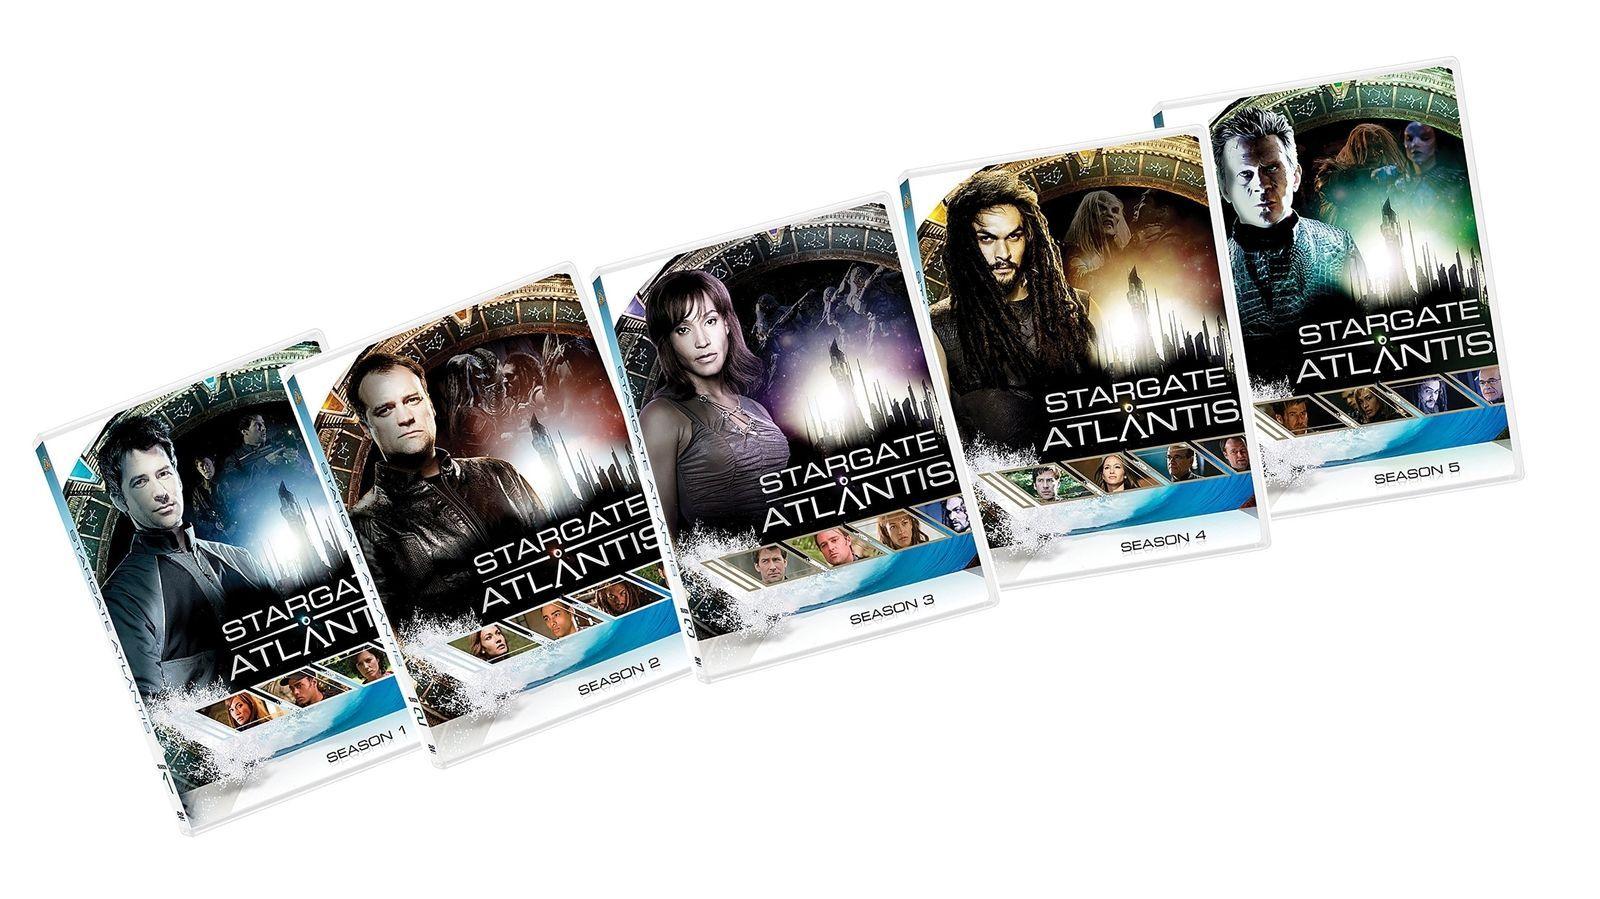 Stargate Atlantis: The Complete Series [DVD Sets New]